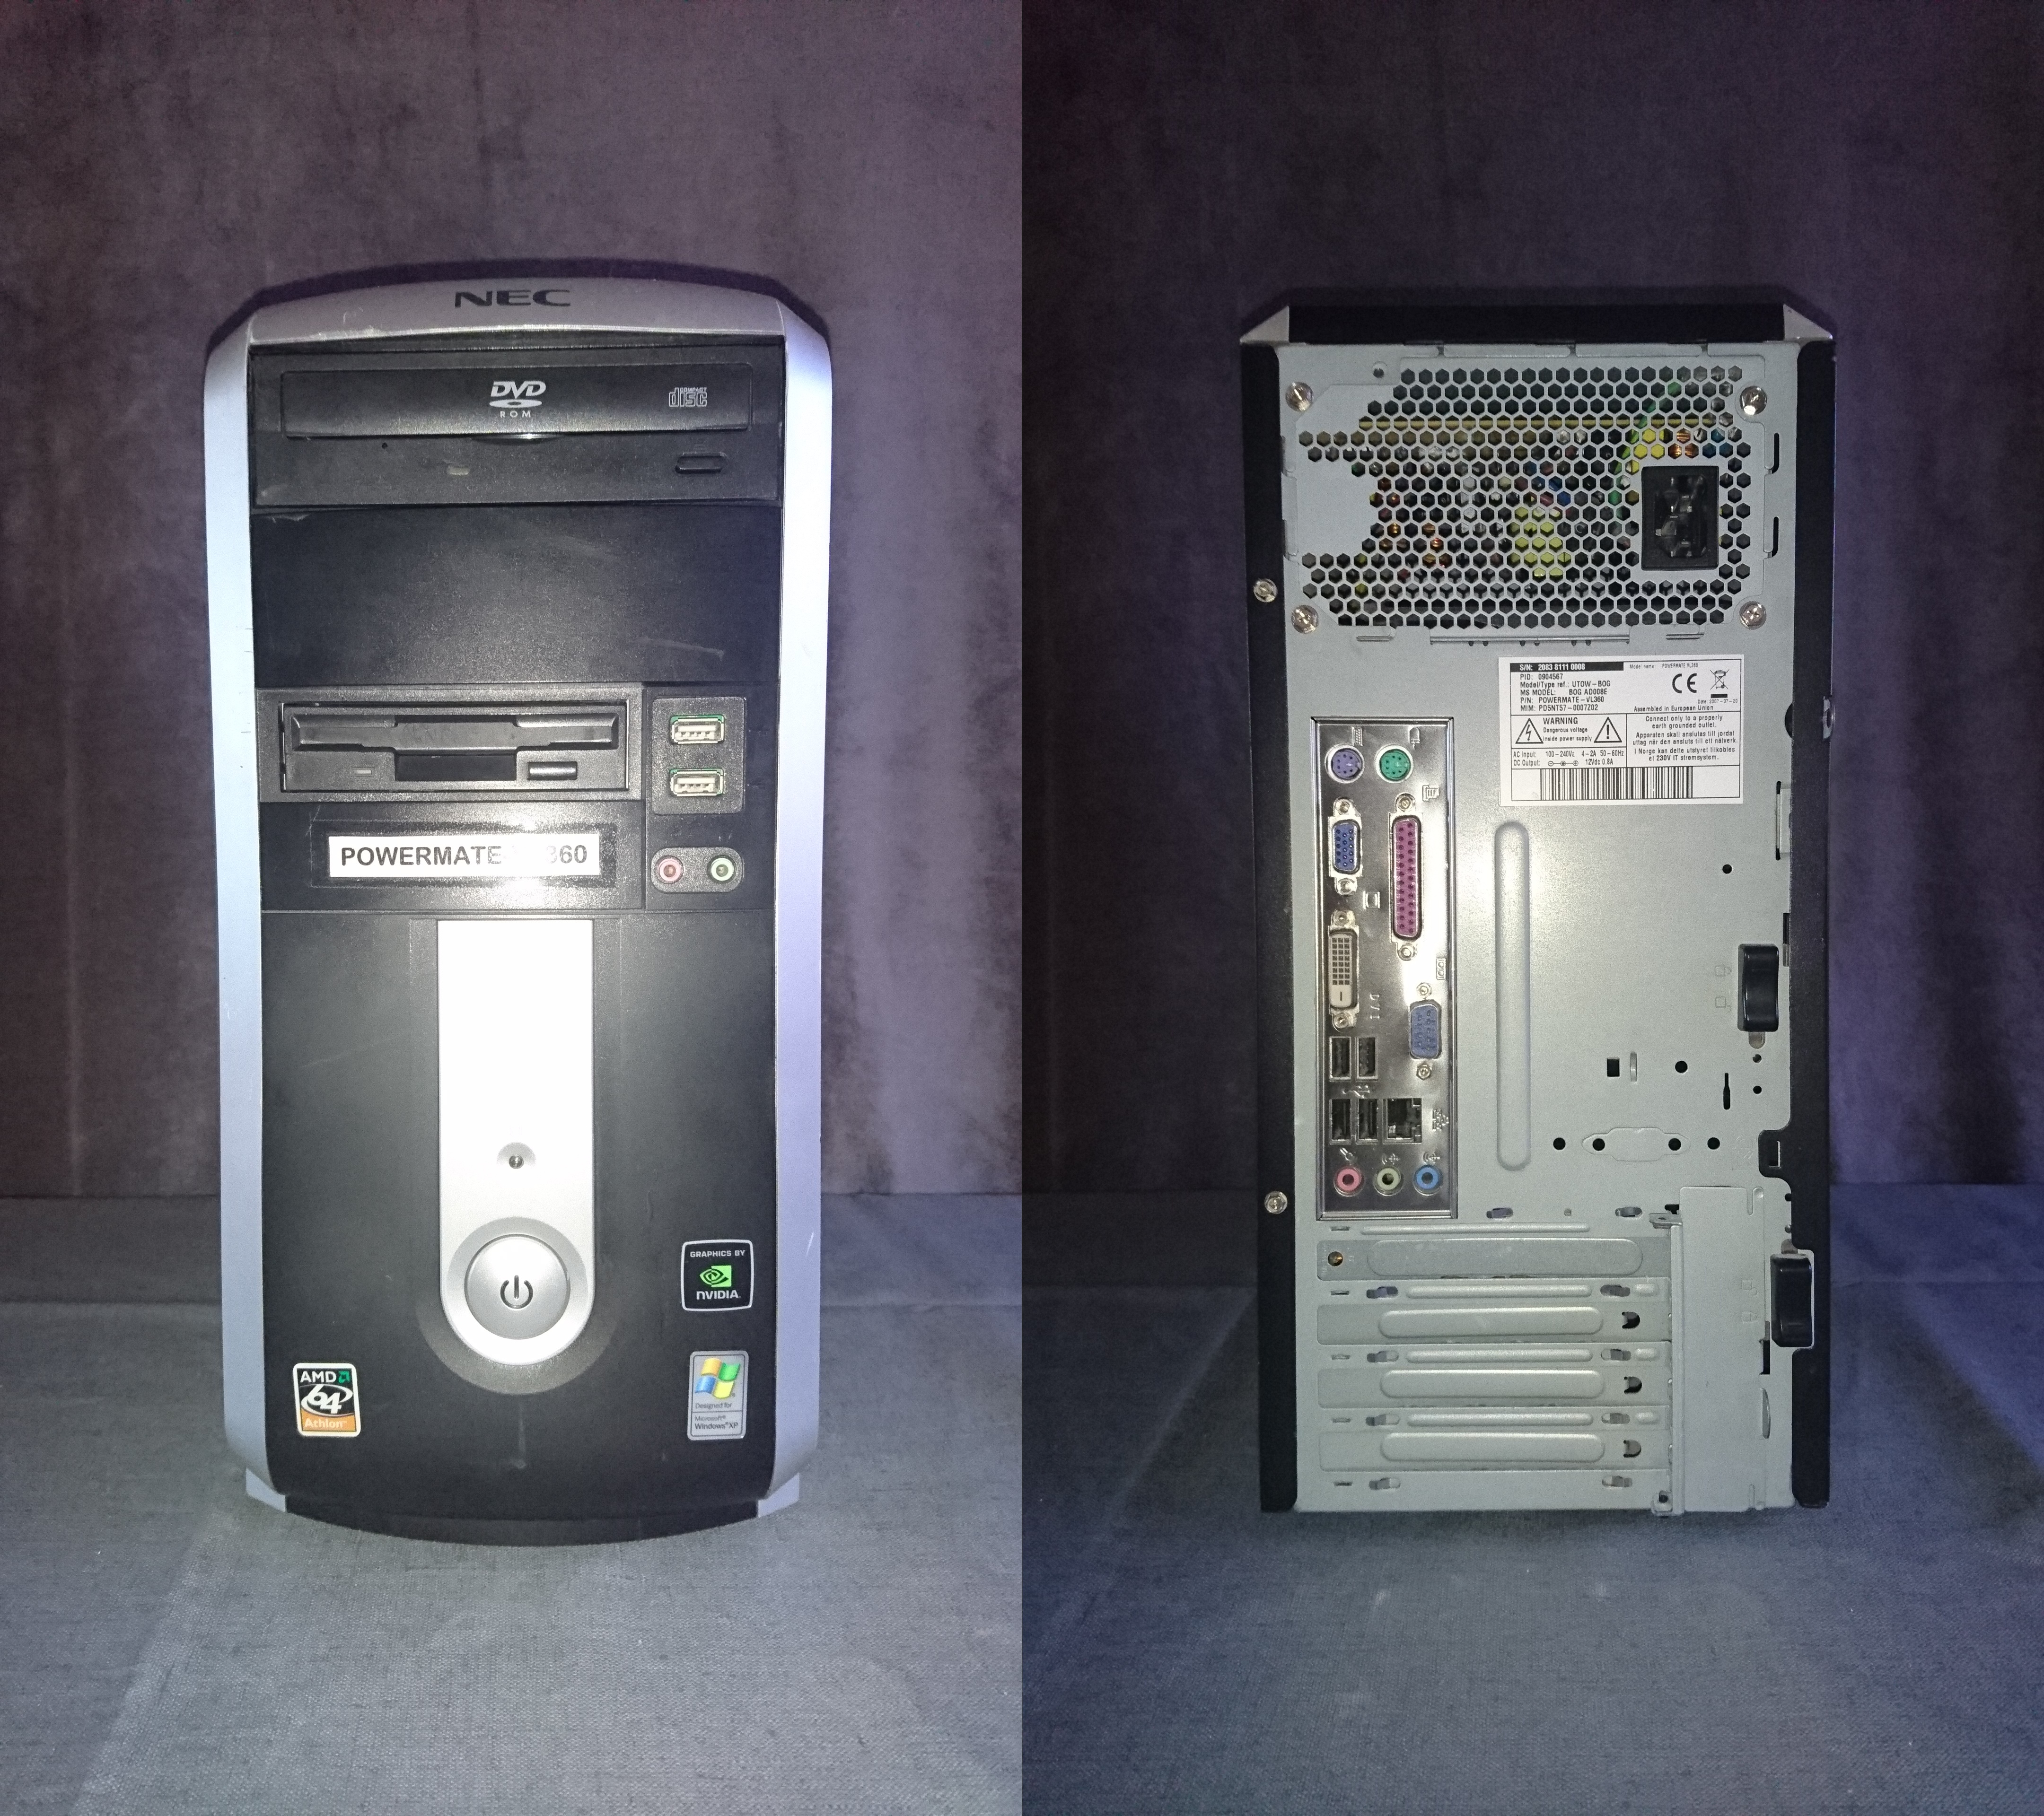 POWERMATE-VL360.jpg